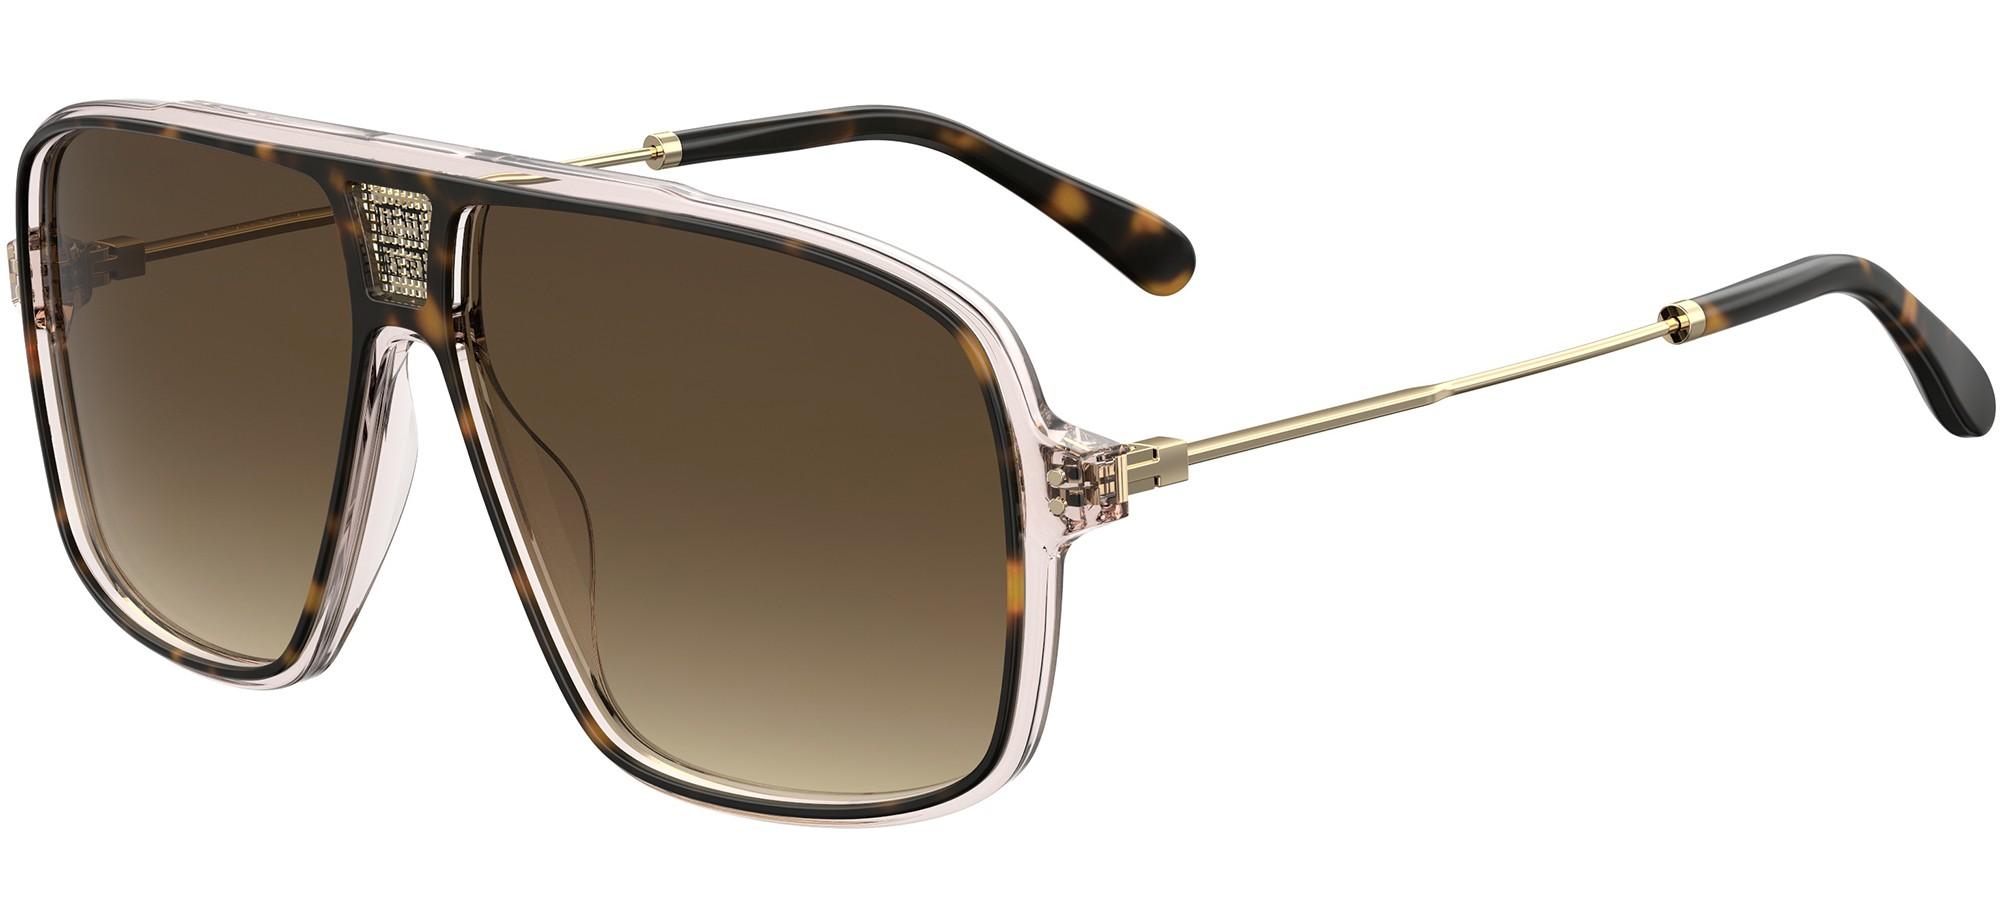 Givenchy sunglasses GV 7138/S